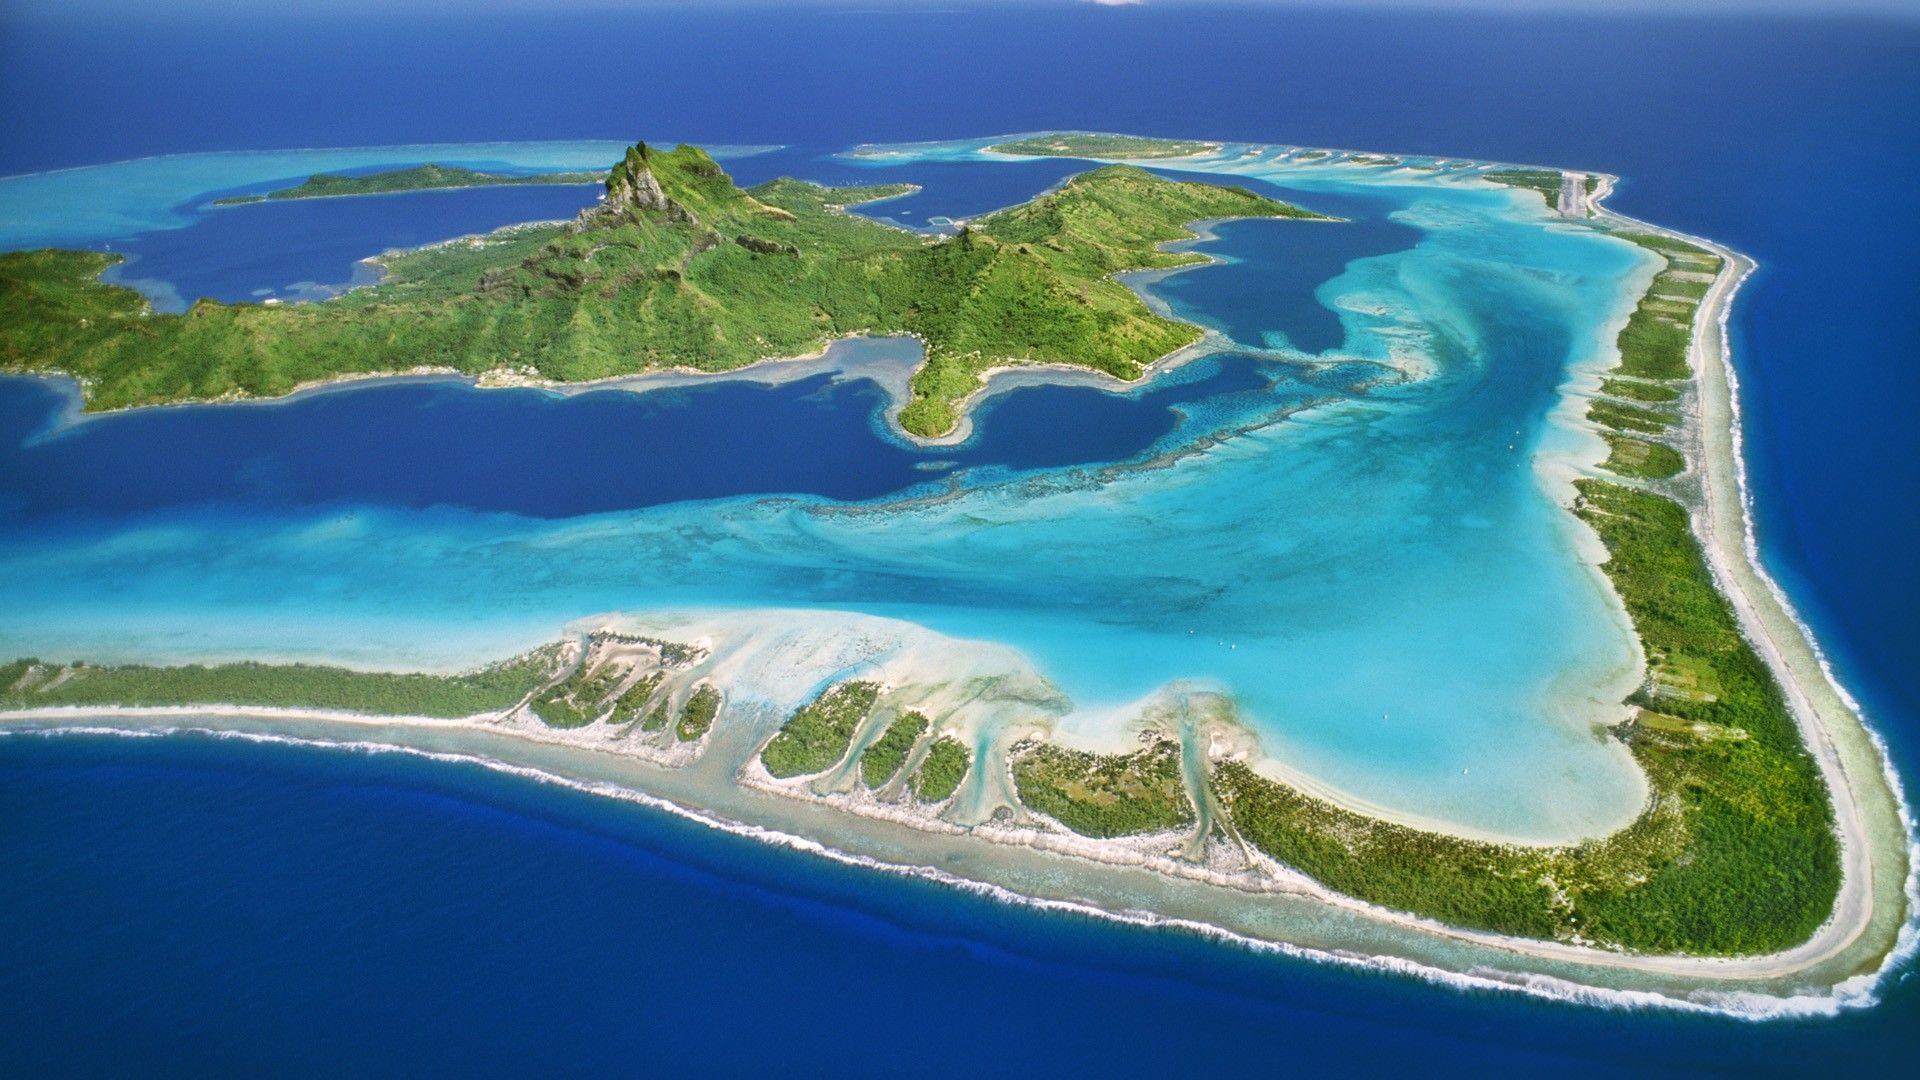 Bora Bora Island >> Bora Bora Island Portuguese Man O War Bora Bora Island